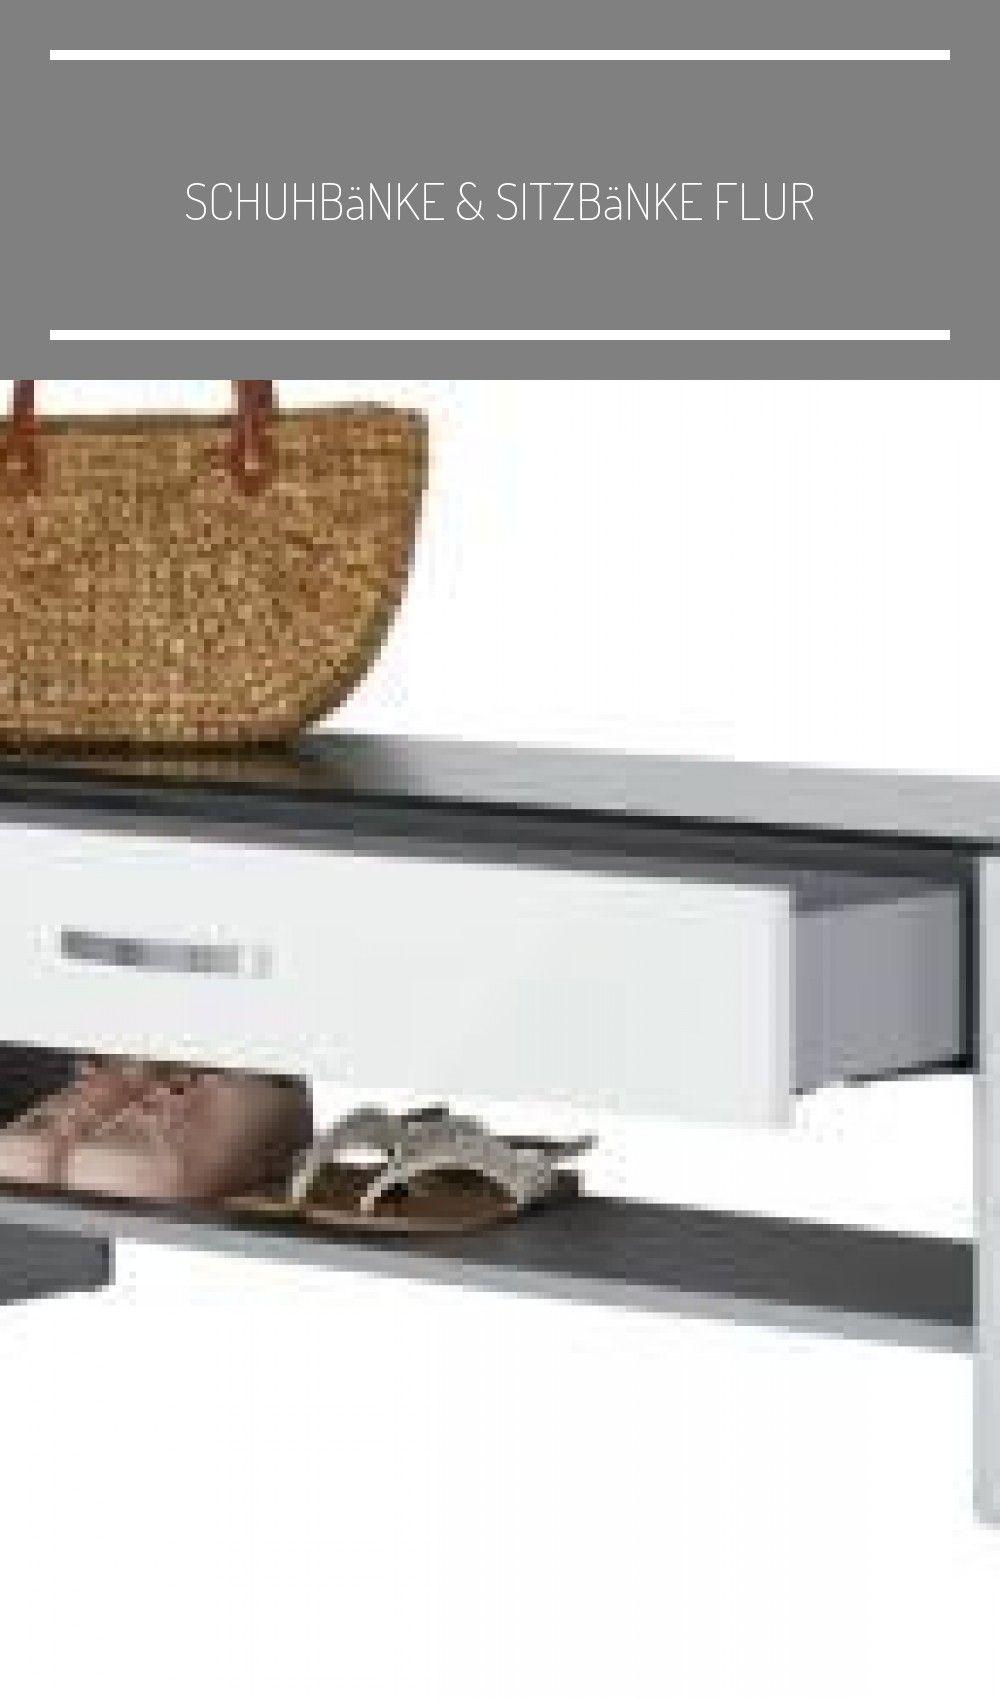 Garderobenbank Grau 117 Cm 46 Cm 34 Cm Banke Einzelbanke Mobel Kraftmobel Kraft Garderobe Ikea Schuhbanke S In 2020 Home Decor Furniture Vintage Crochet